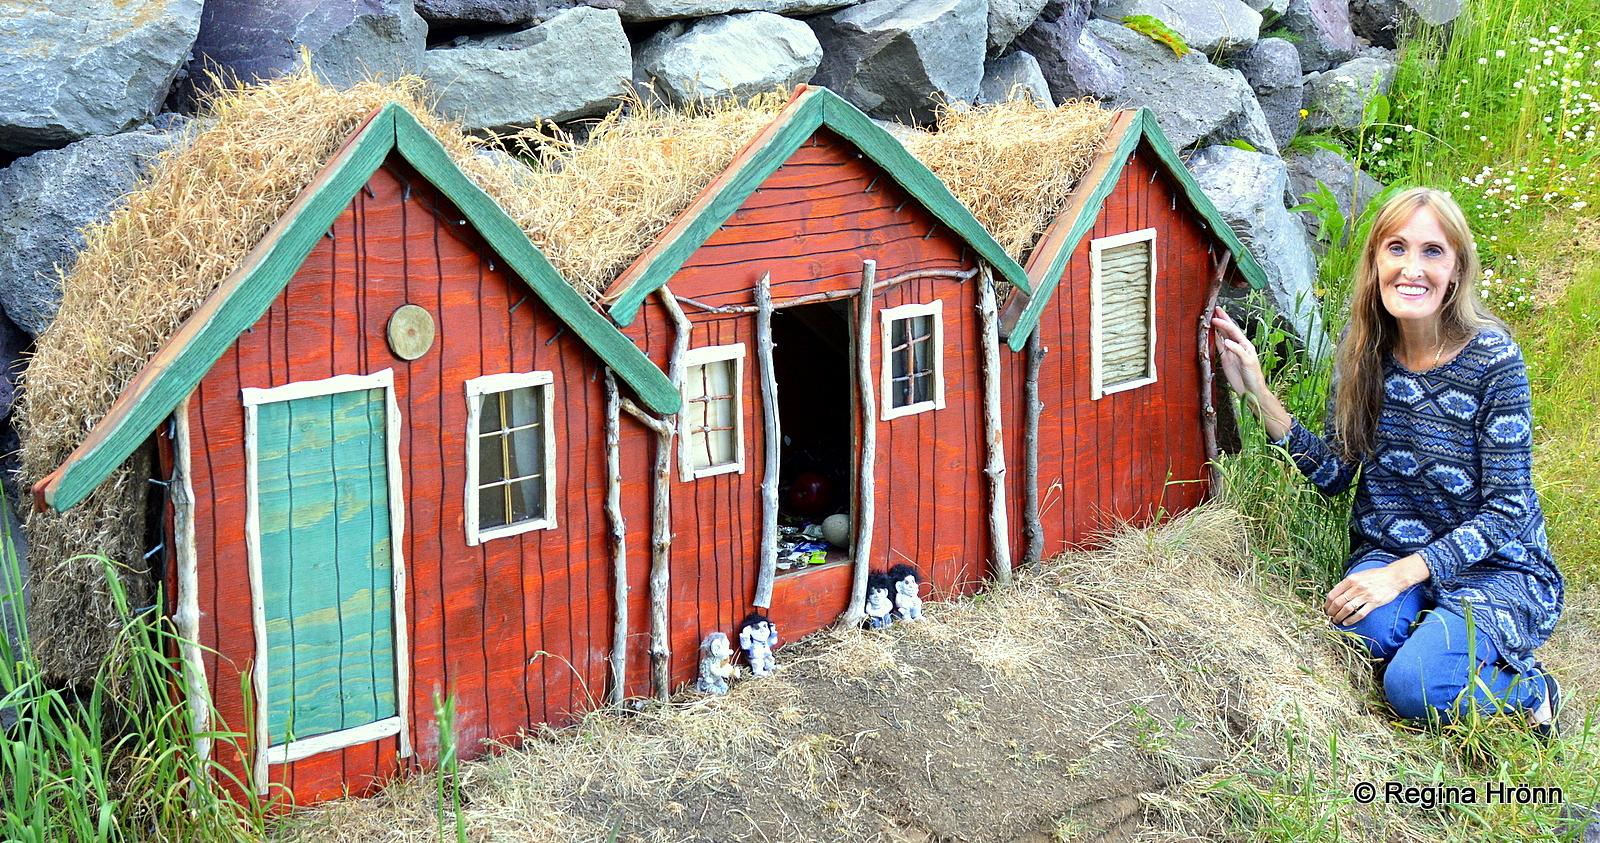 Regína by a replica of the elf house in Húsavík from the film Eurovision - the Fire Saga